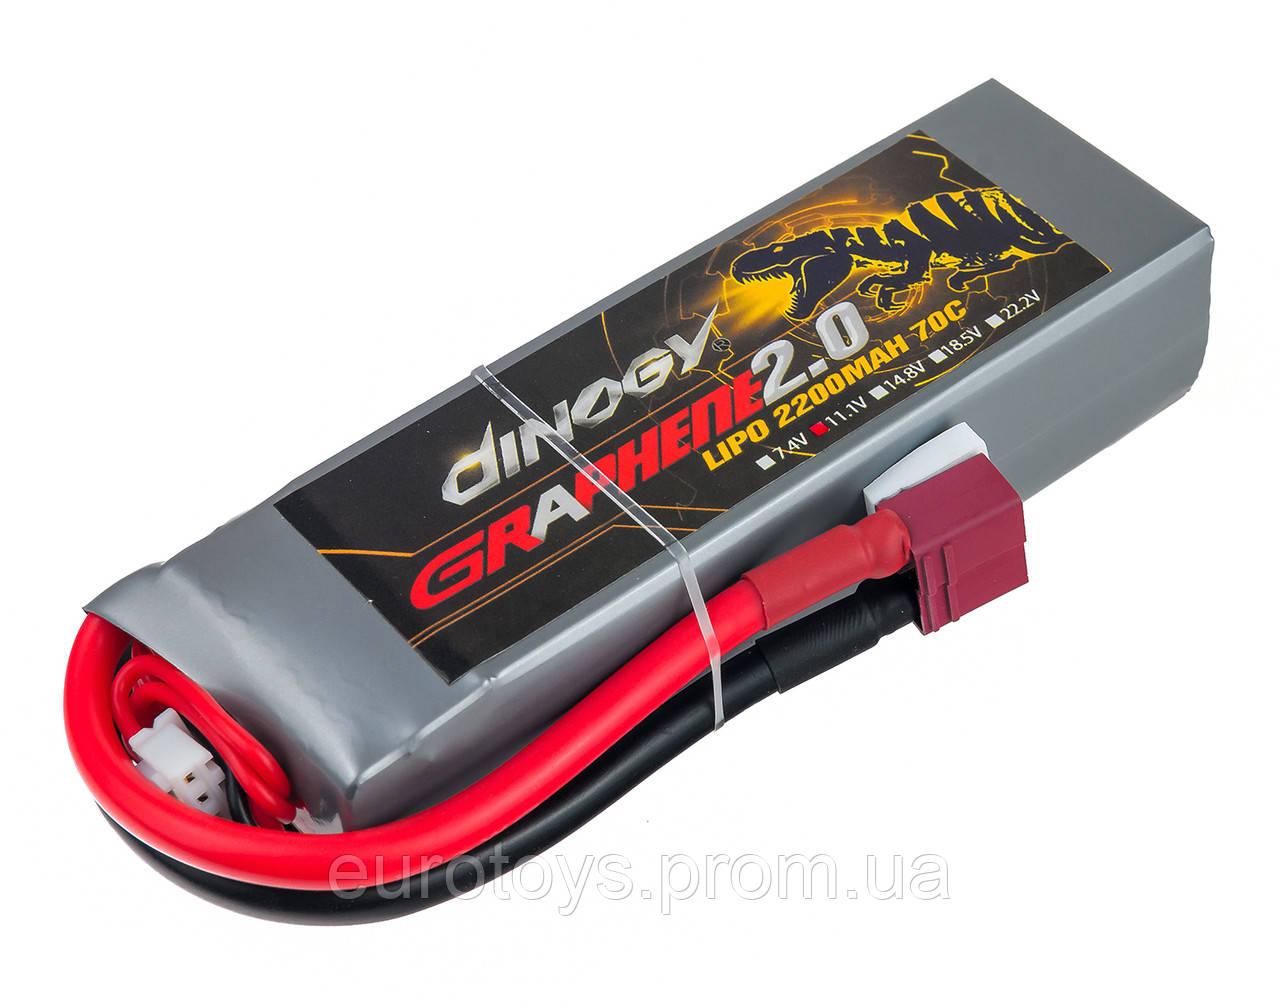 Аккумулятор для квадрокоптера Dinogy G2.0 Li-Pol 2200 мАч 11.1 В 110x35x24 мм T-Plug 70C